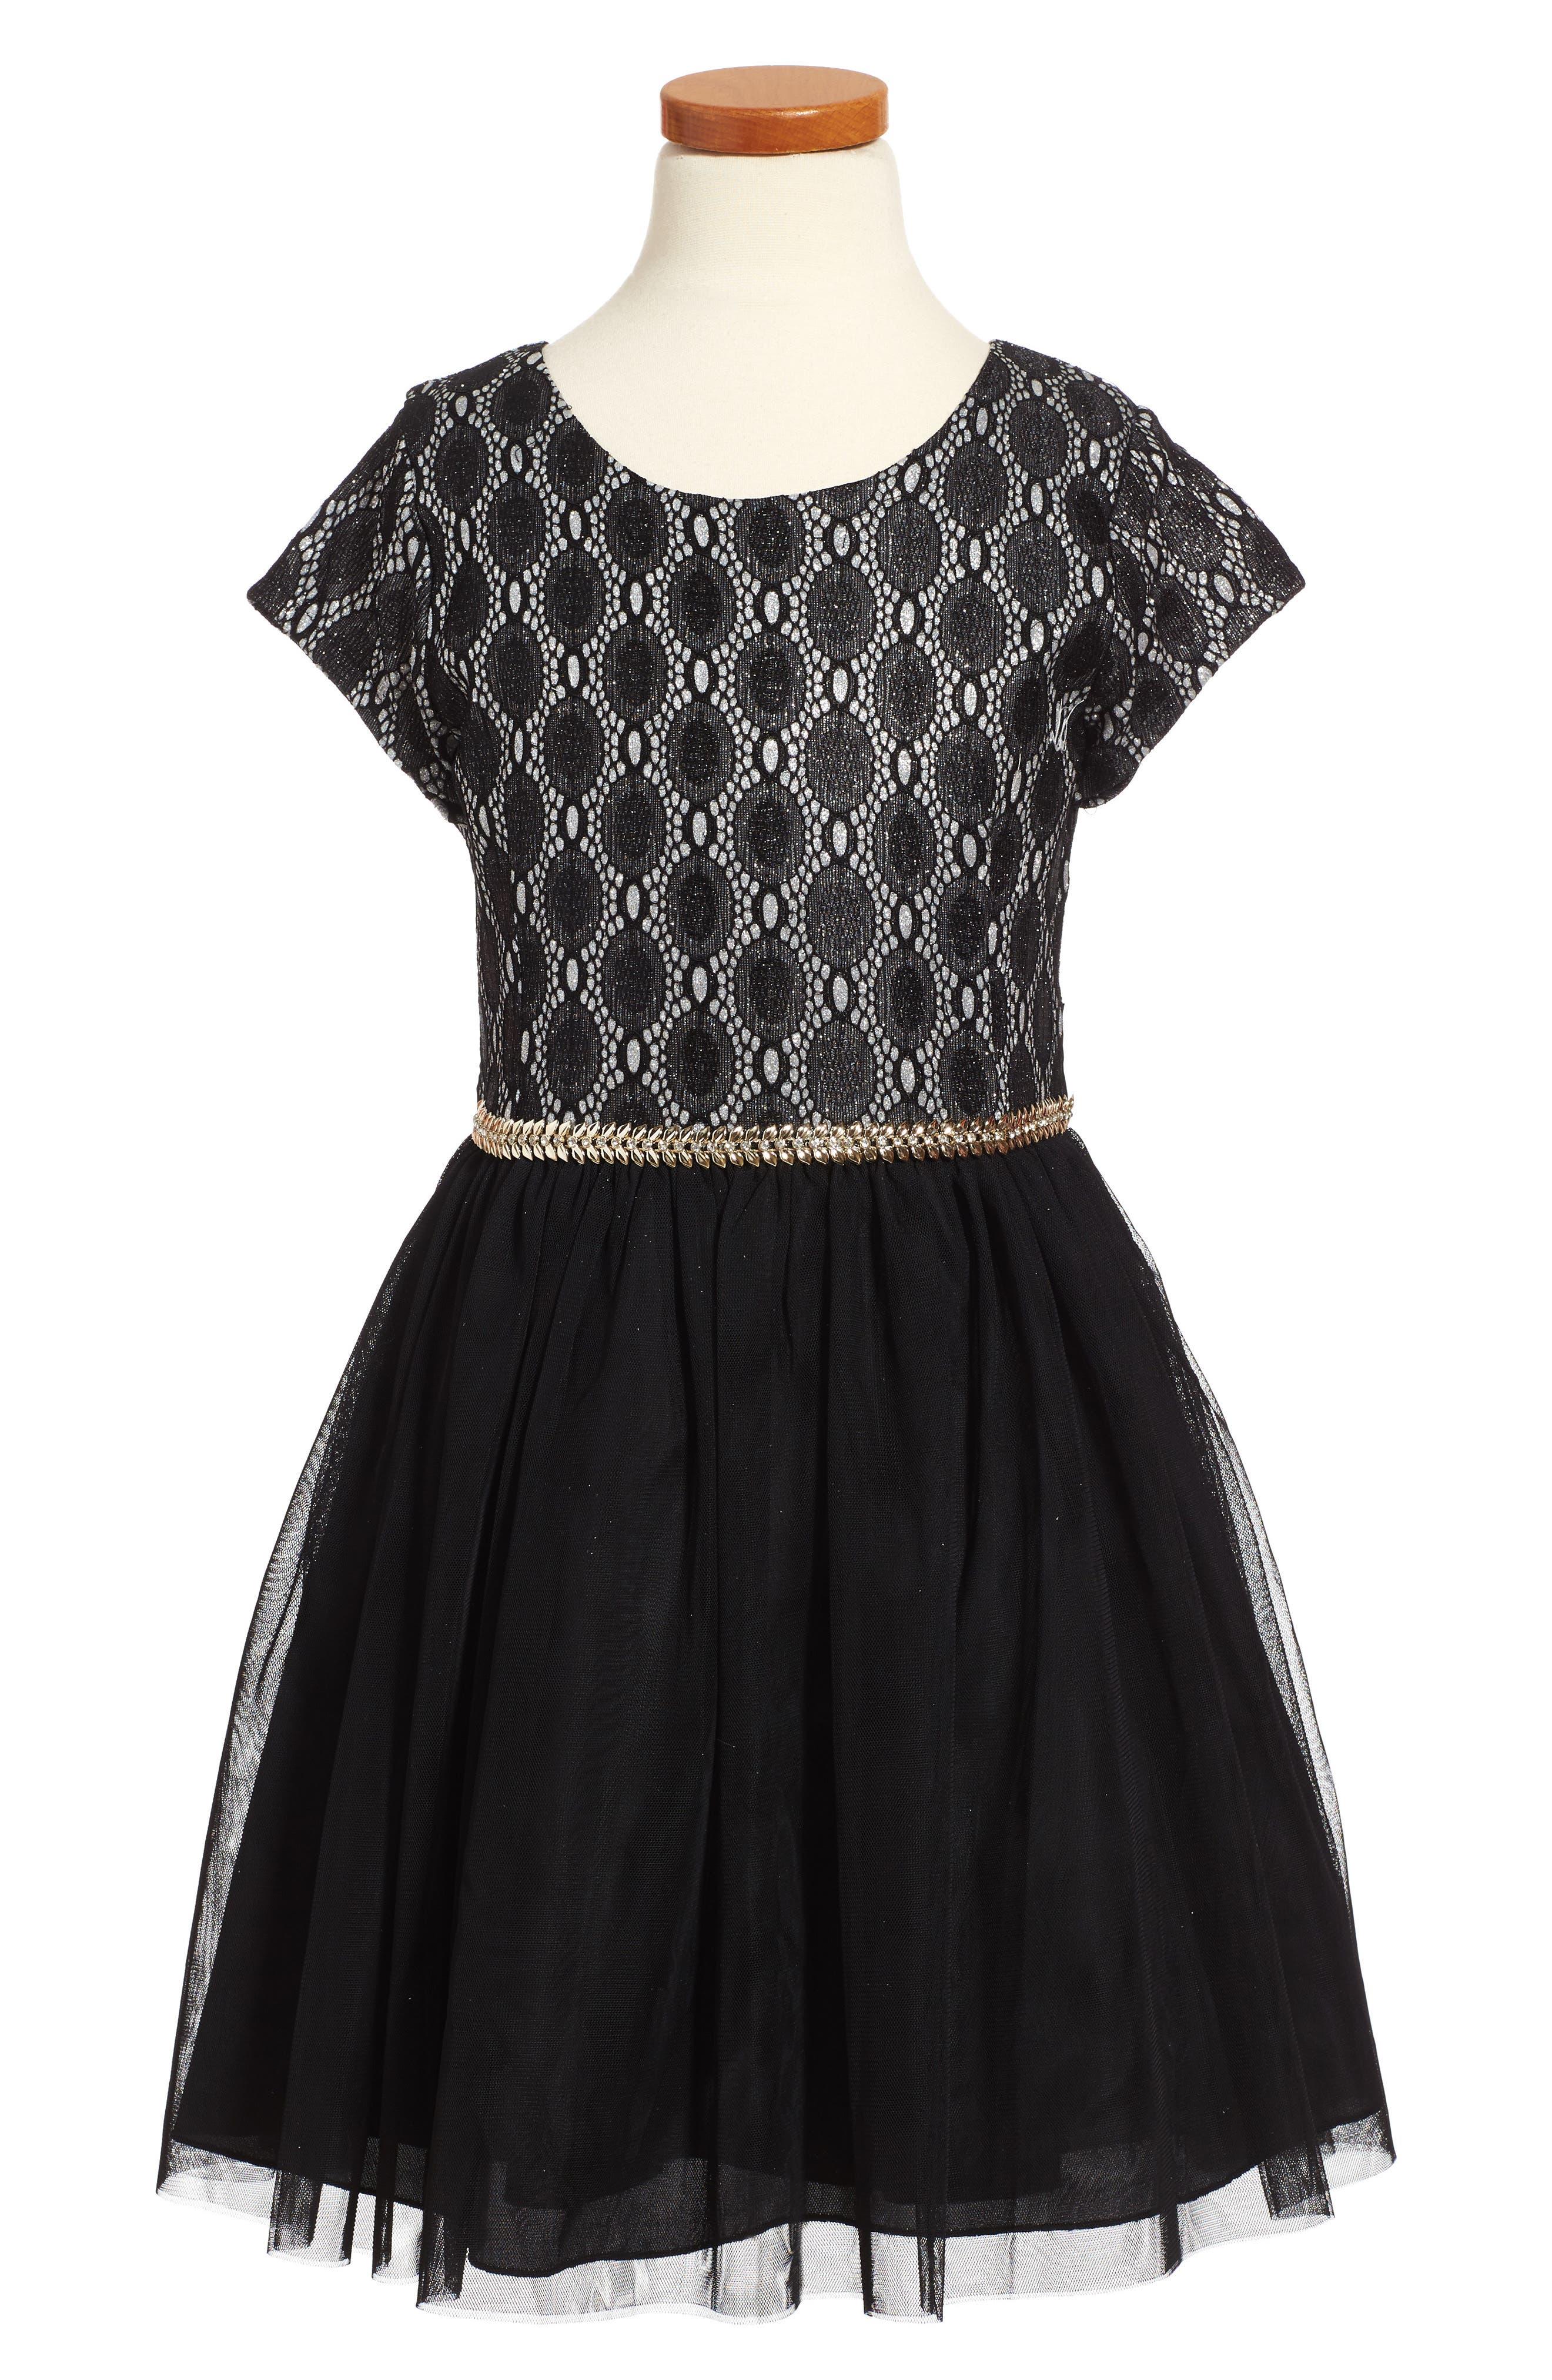 Alternate Image 1 Selected - Nanette Lepore Glitter Lace Dress (Big Girls)